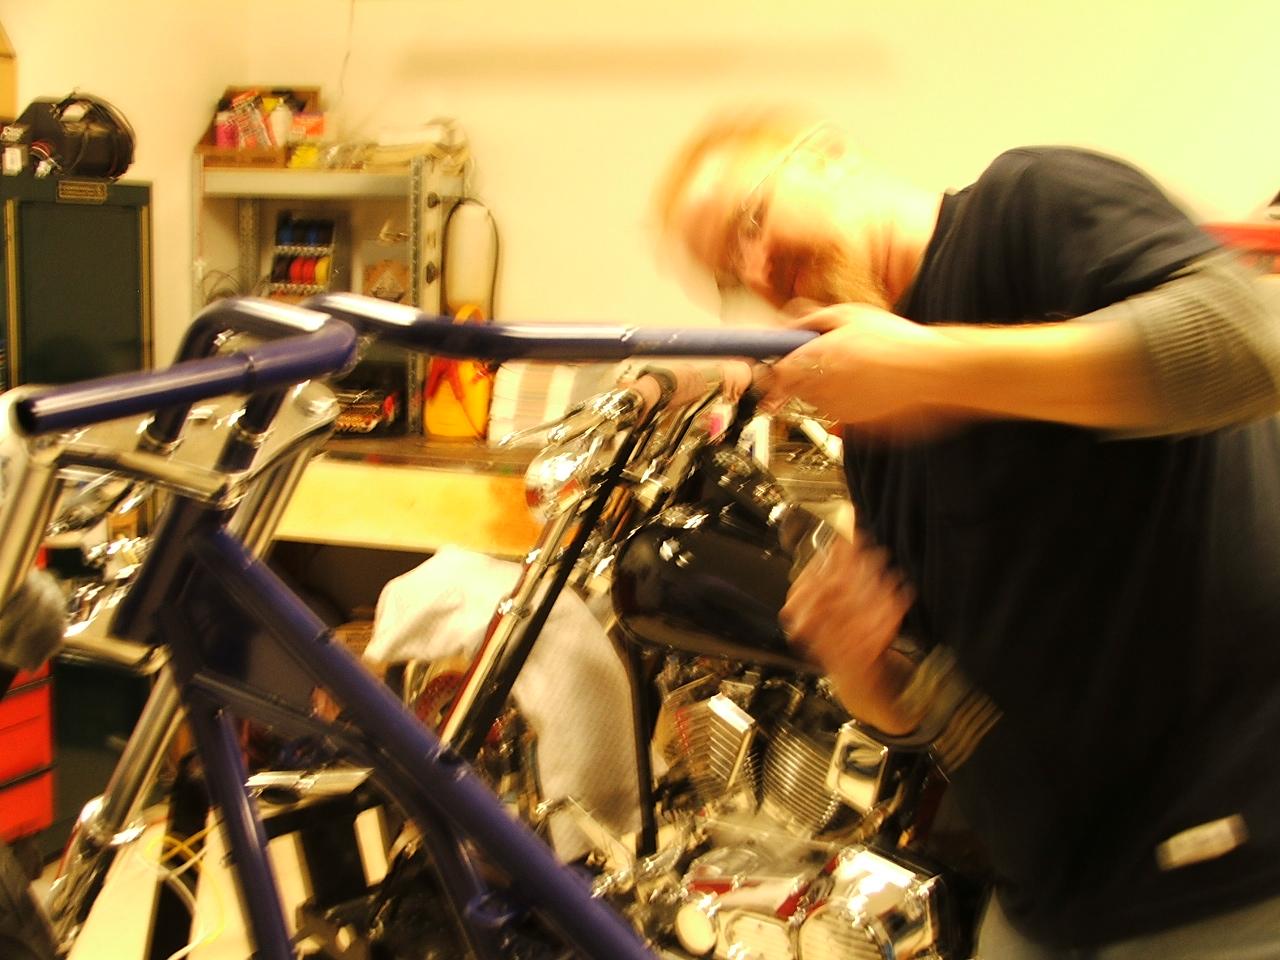 prject-bike-pictutes2-013